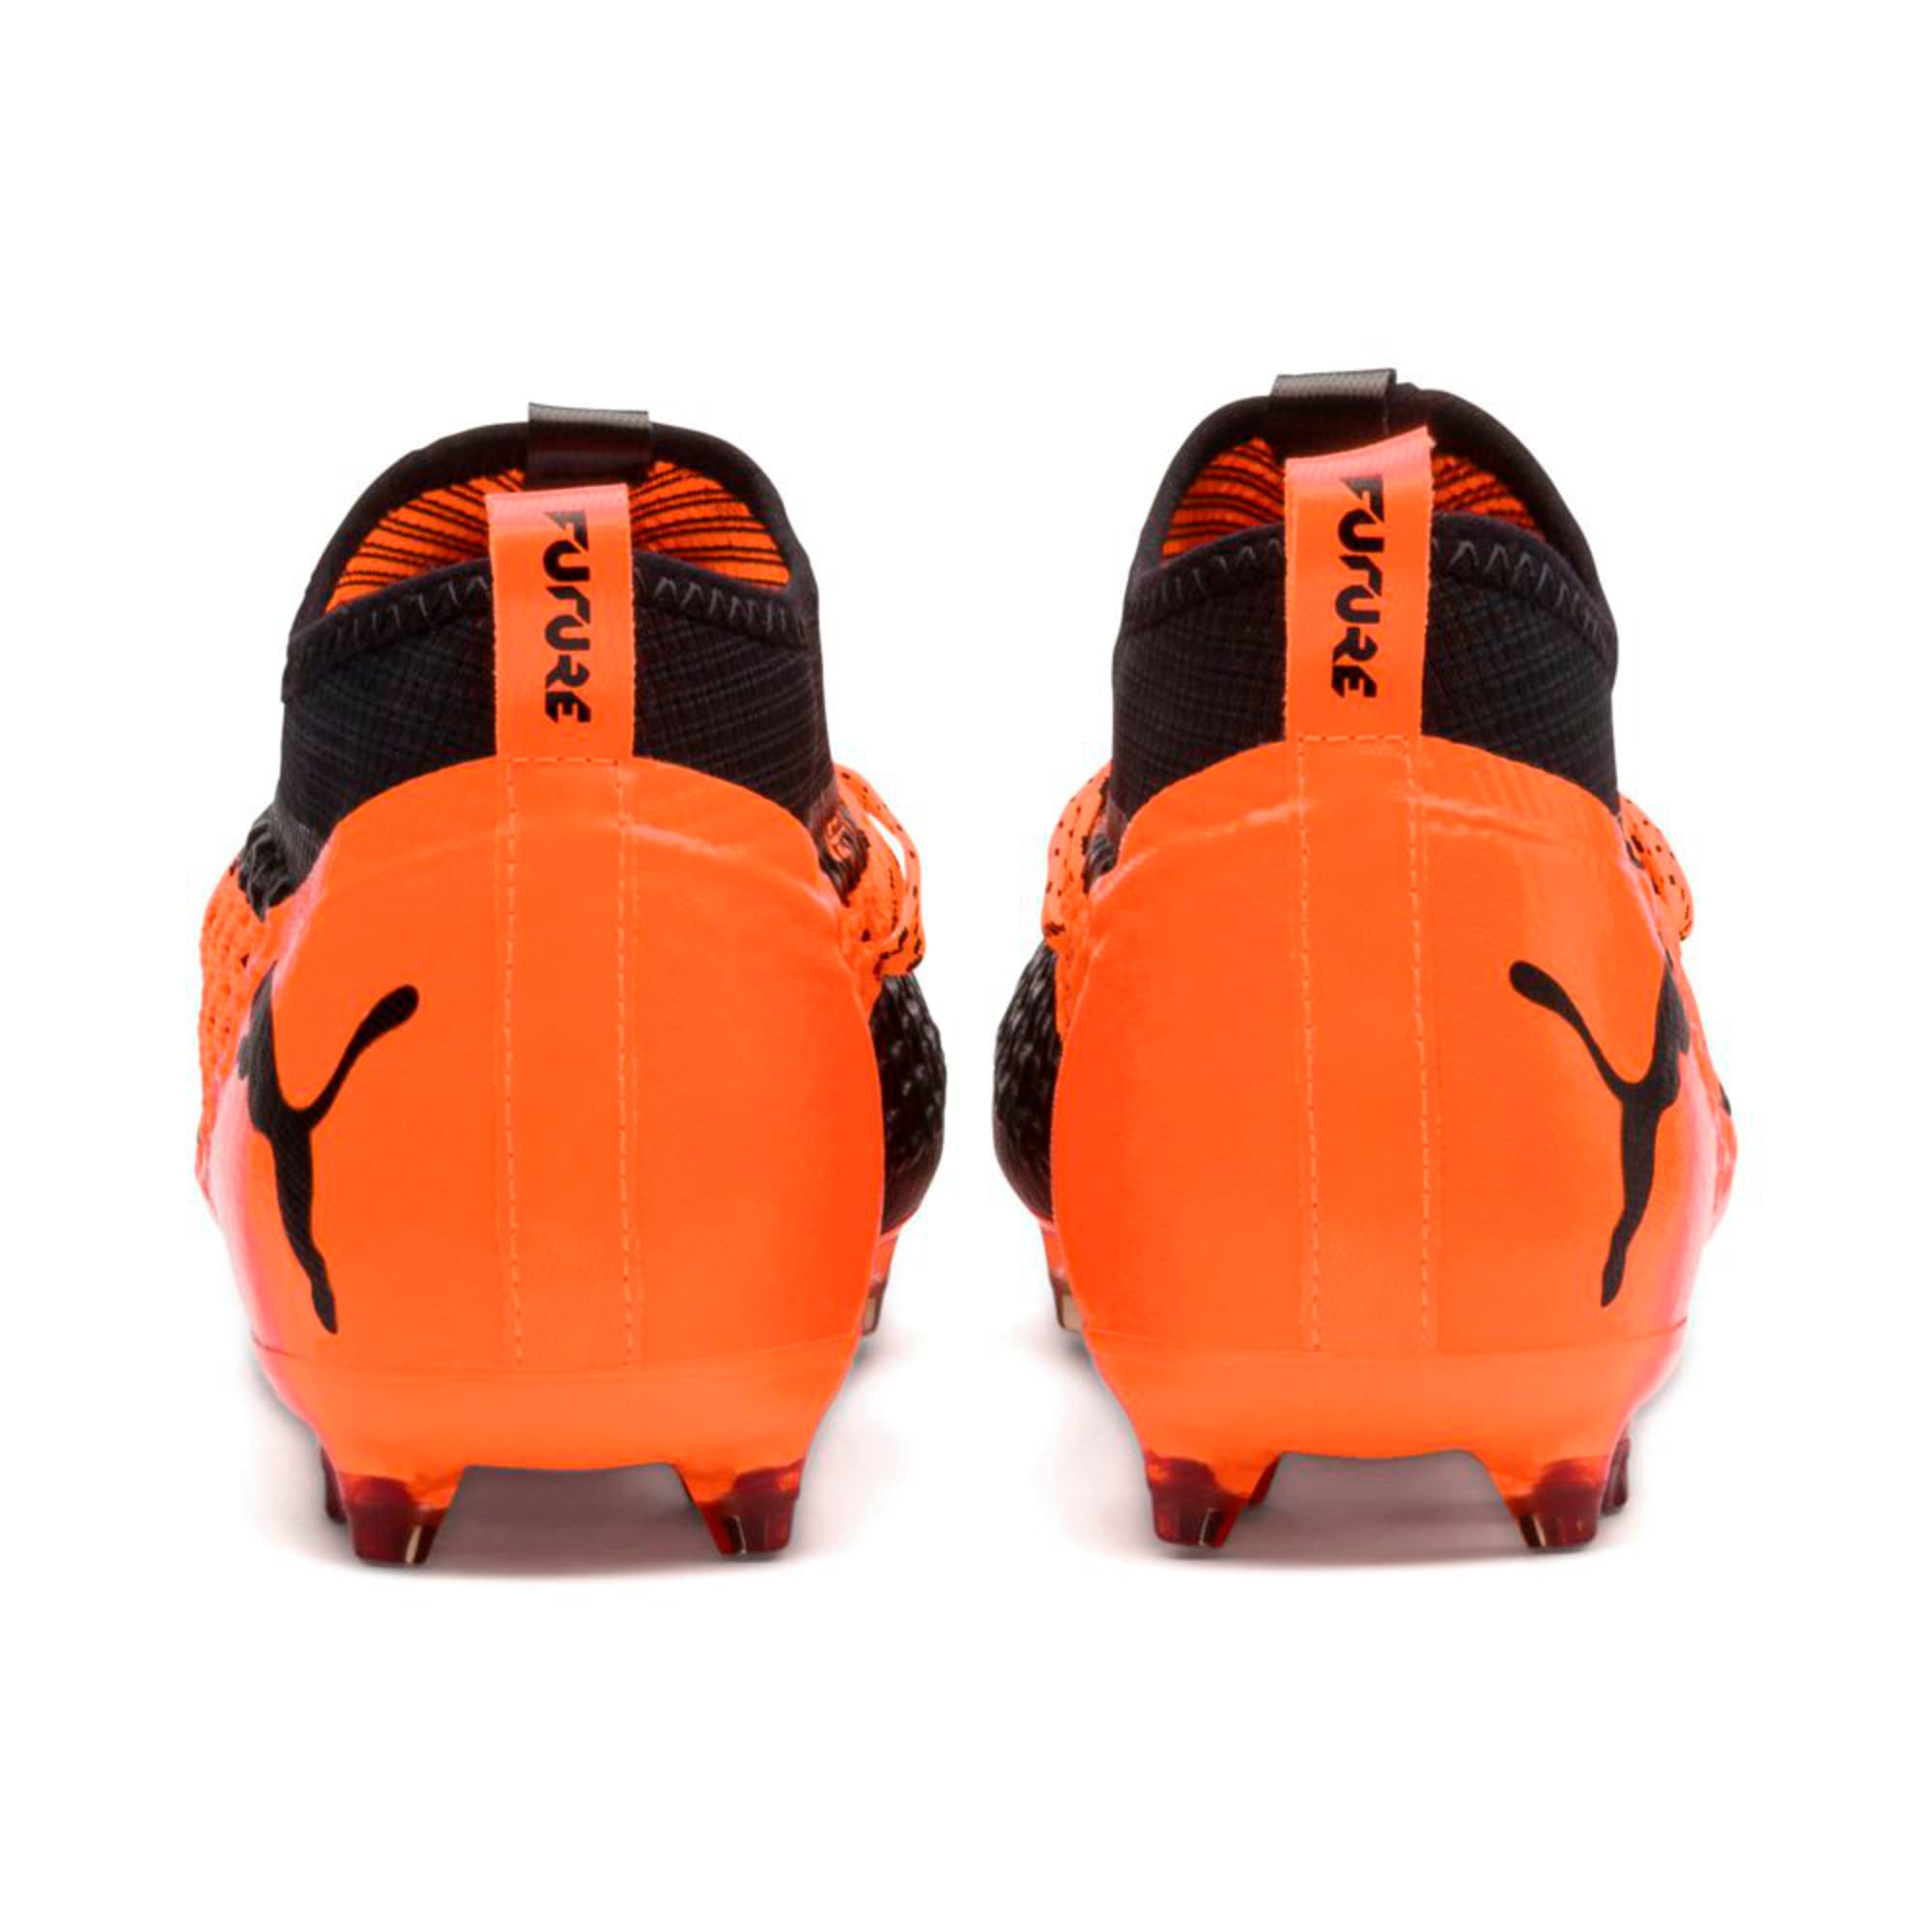 Thumbnail 4 of FUTURE 2.2 NETFIT FG/AG  Football Boots, Black-Orange, medium-IND